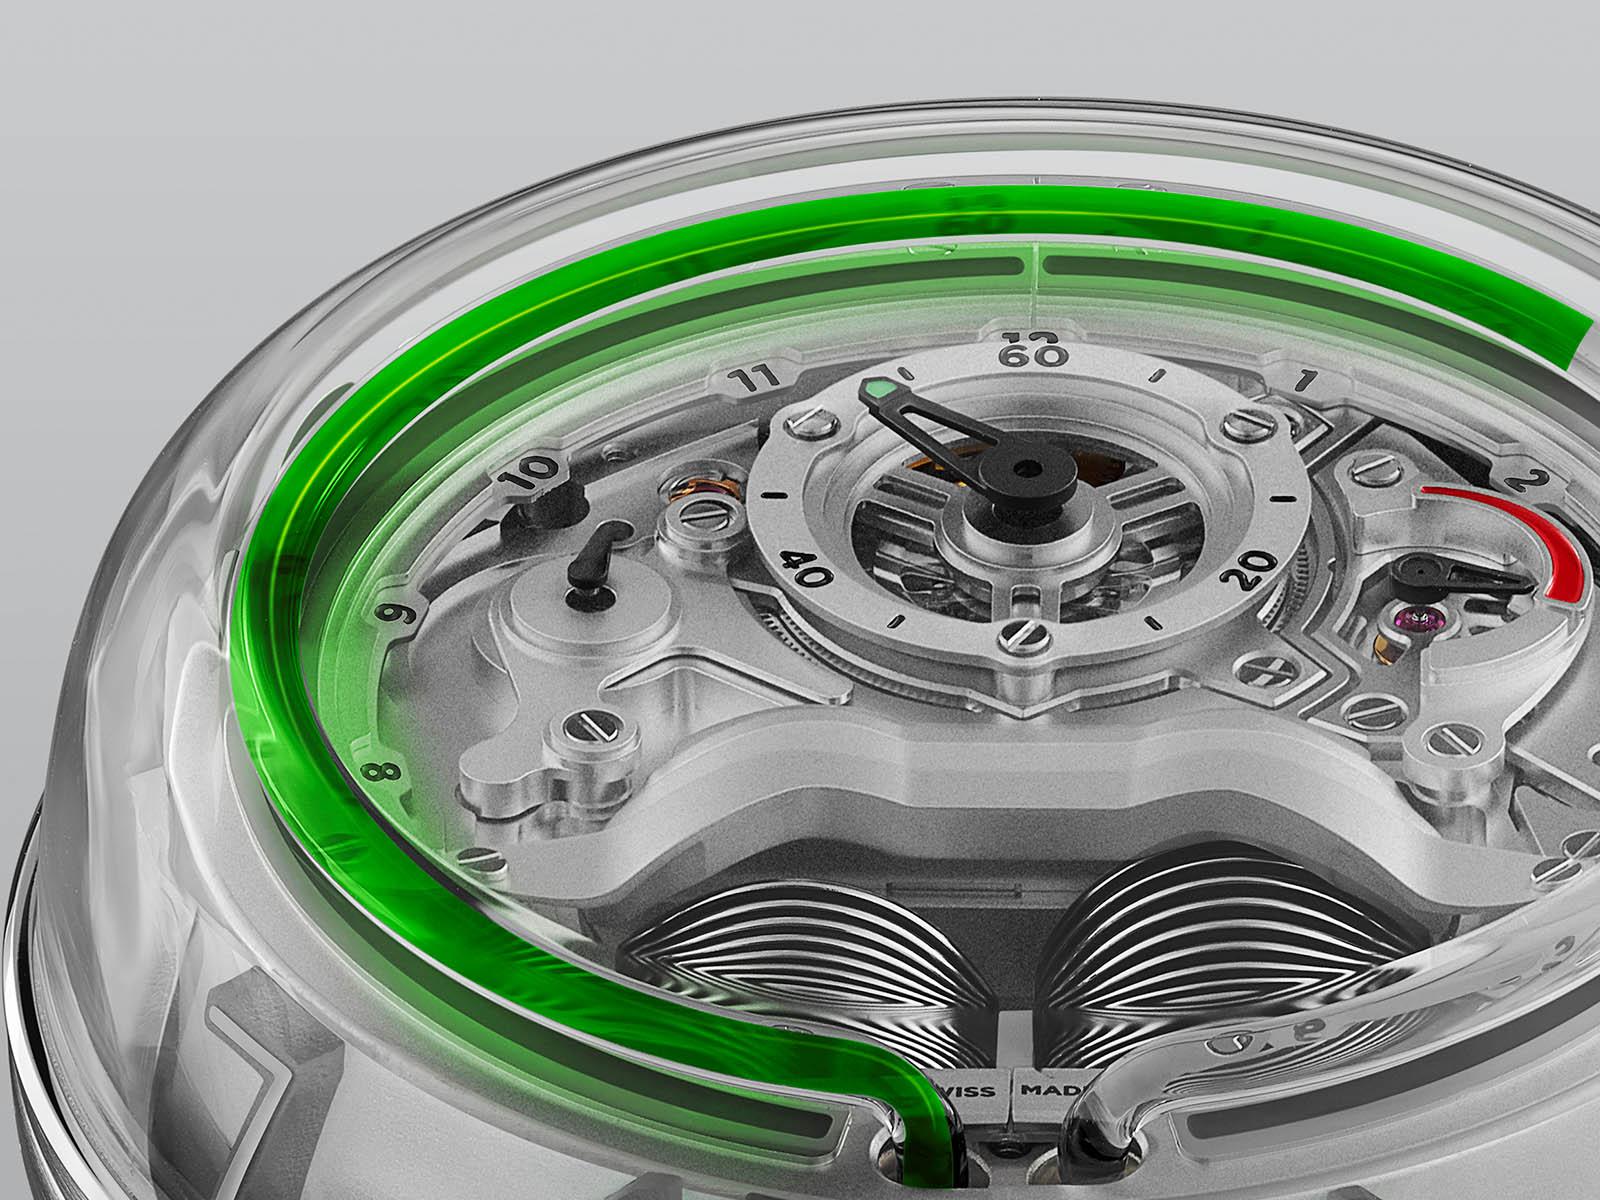 h02351-hyt-h5-green-2.jpg